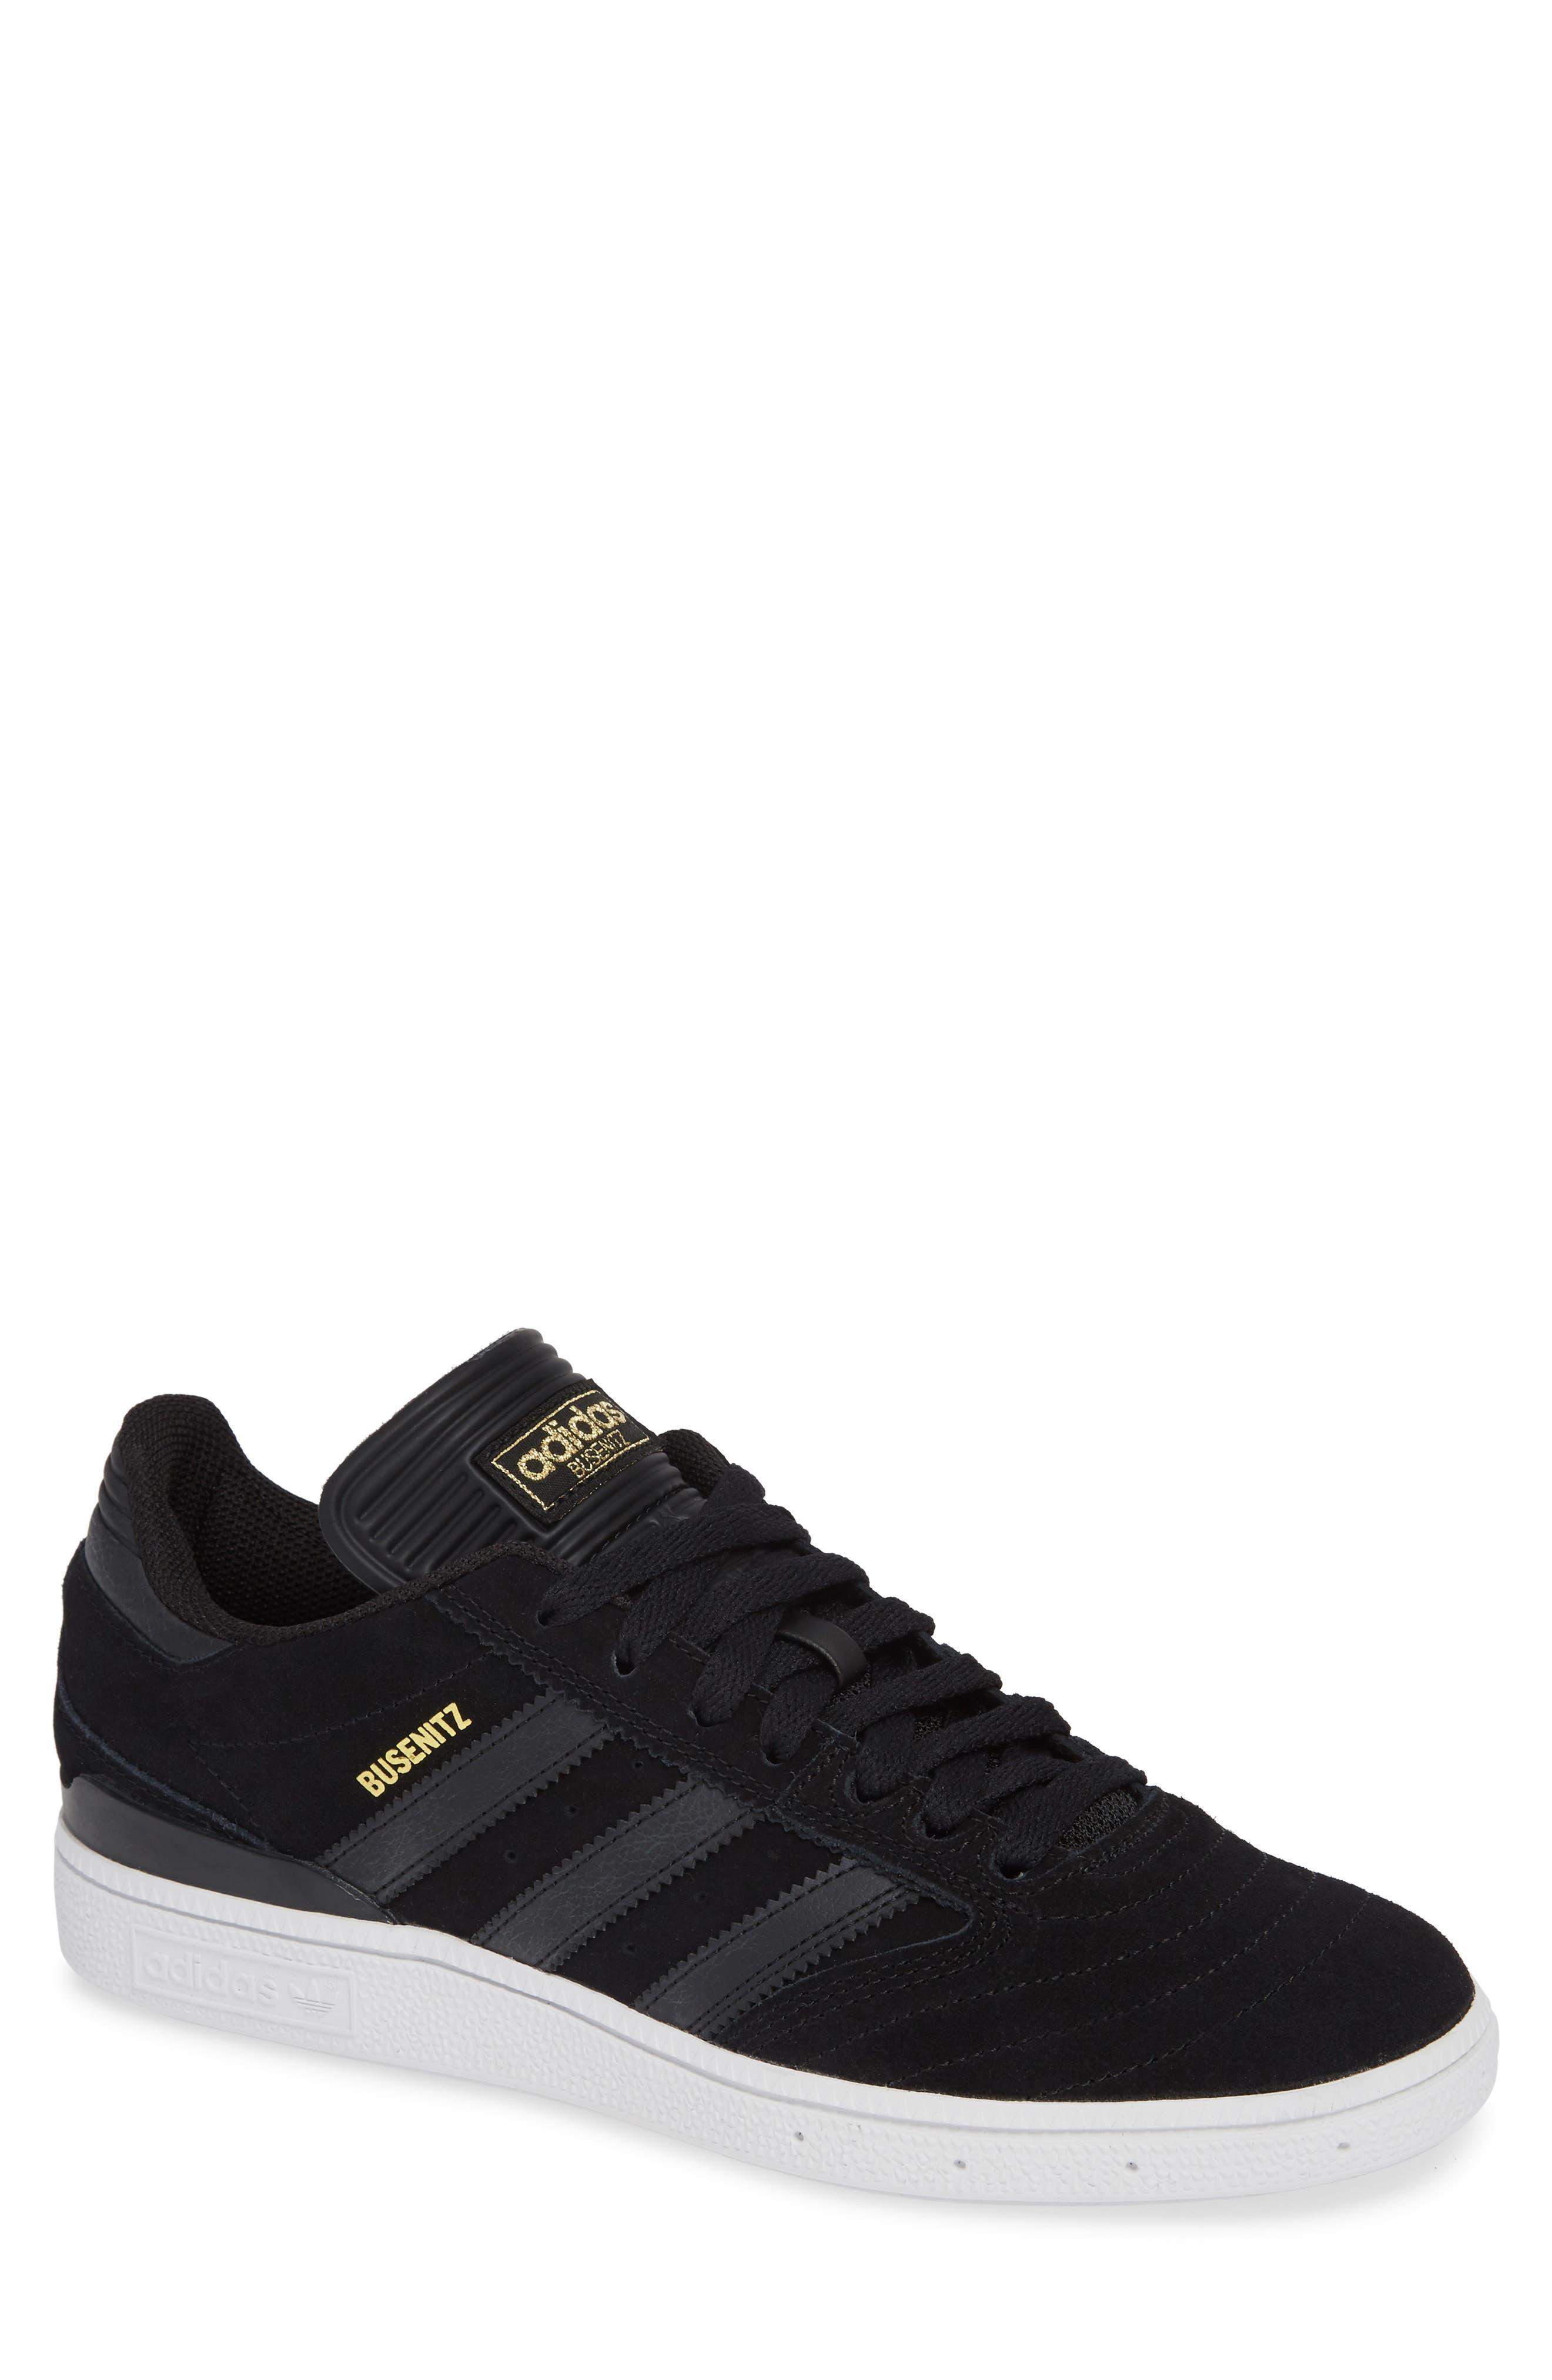 Busenitz Sneaker,                             Main thumbnail 1, color,                             BLACK/ BLACK/ WHITE